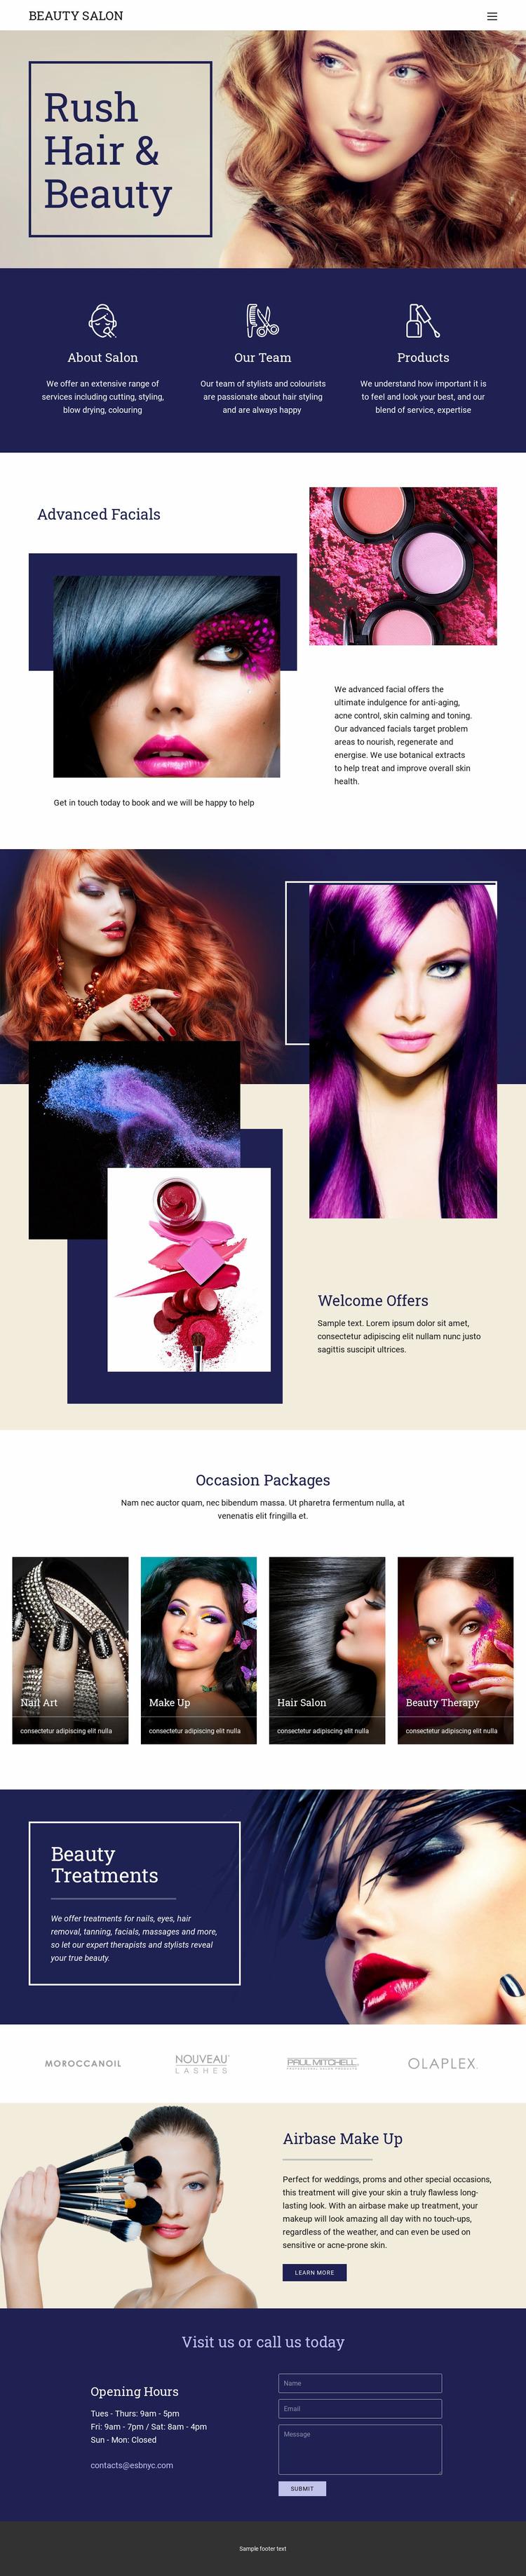 Beauty Salon Website Maker